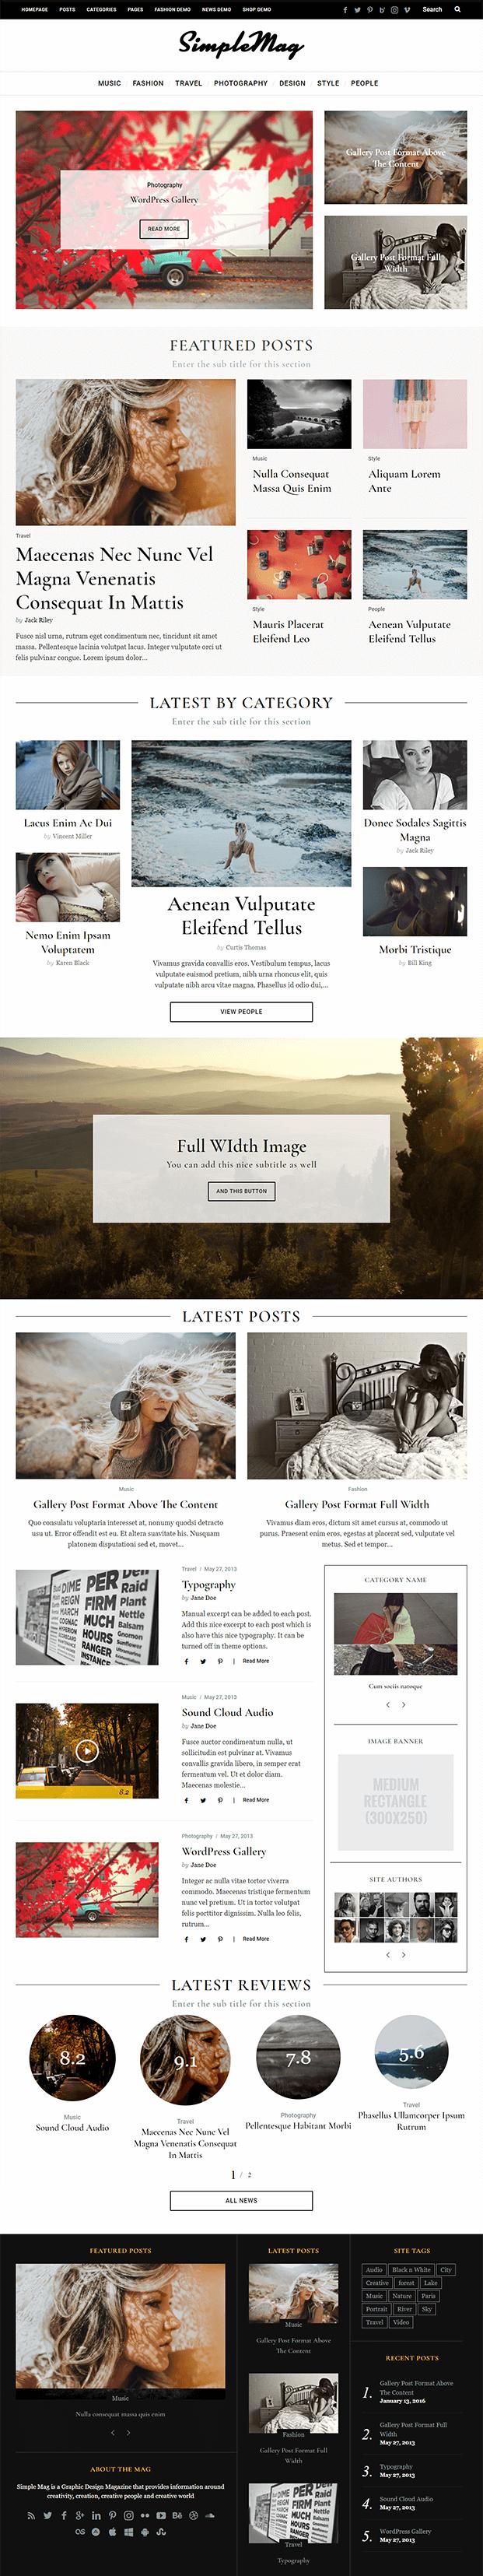 Home - WordPress Online Magazine Theme